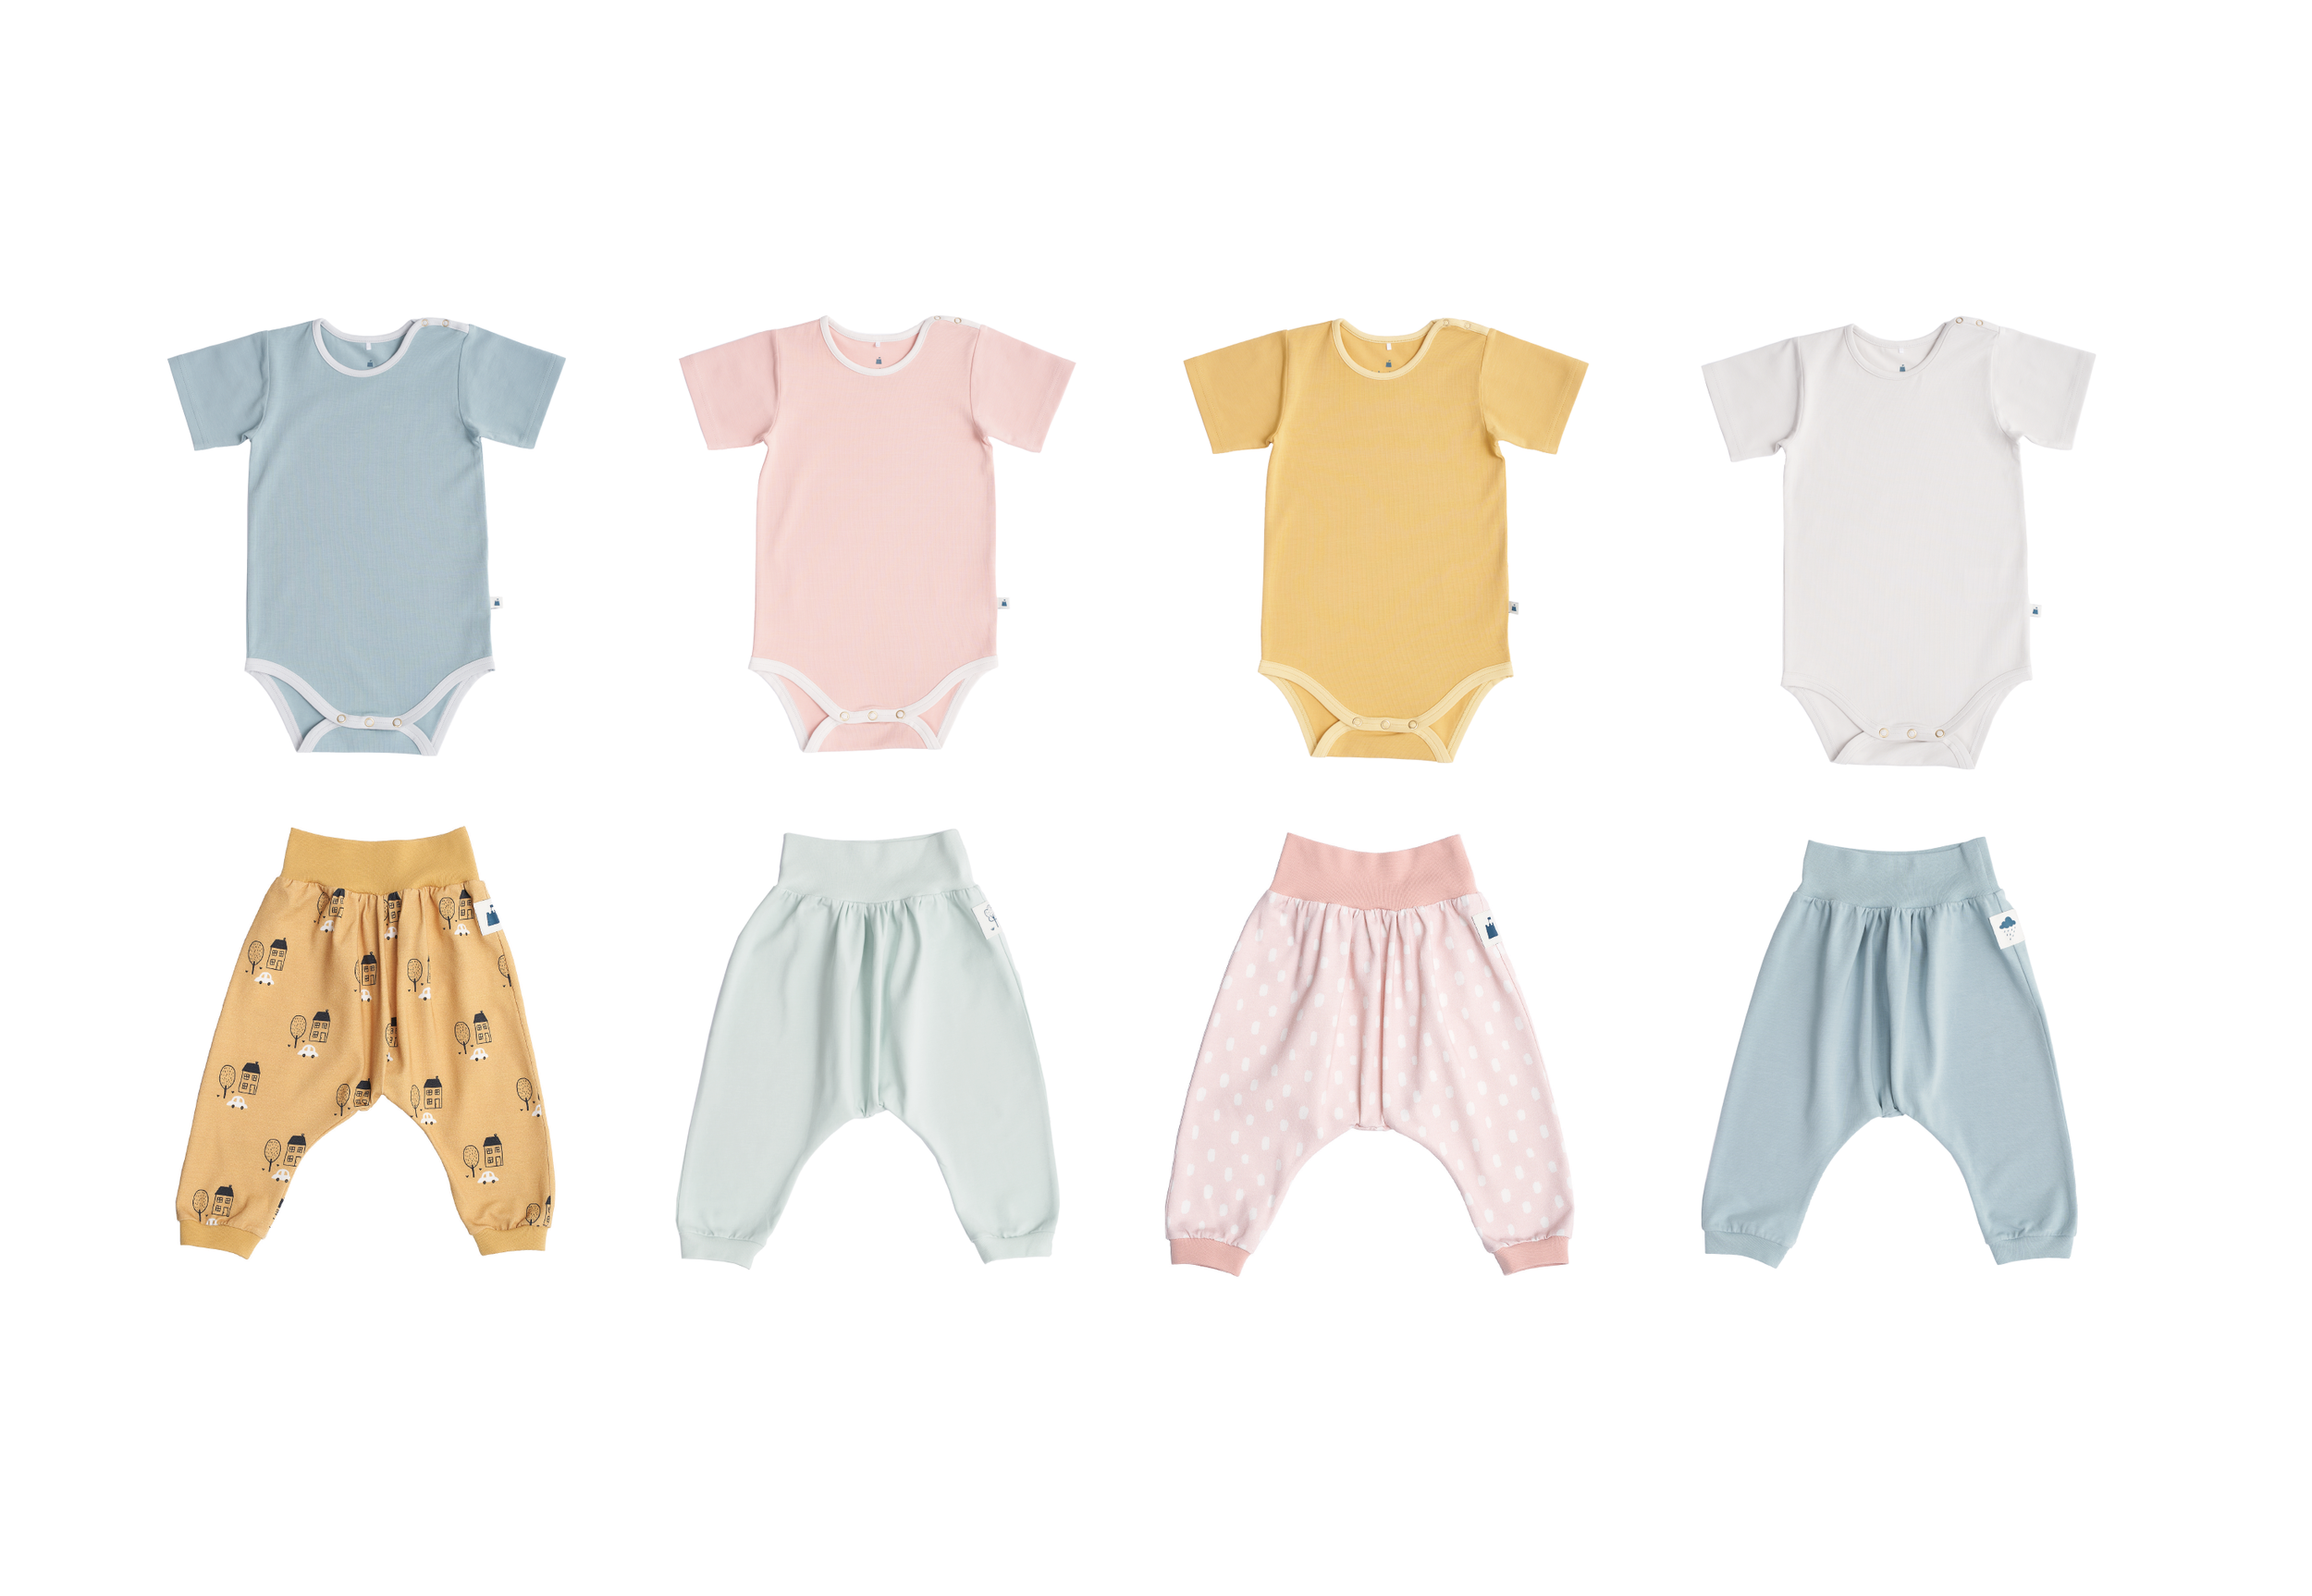 kidswear-designer-cornwall-england06